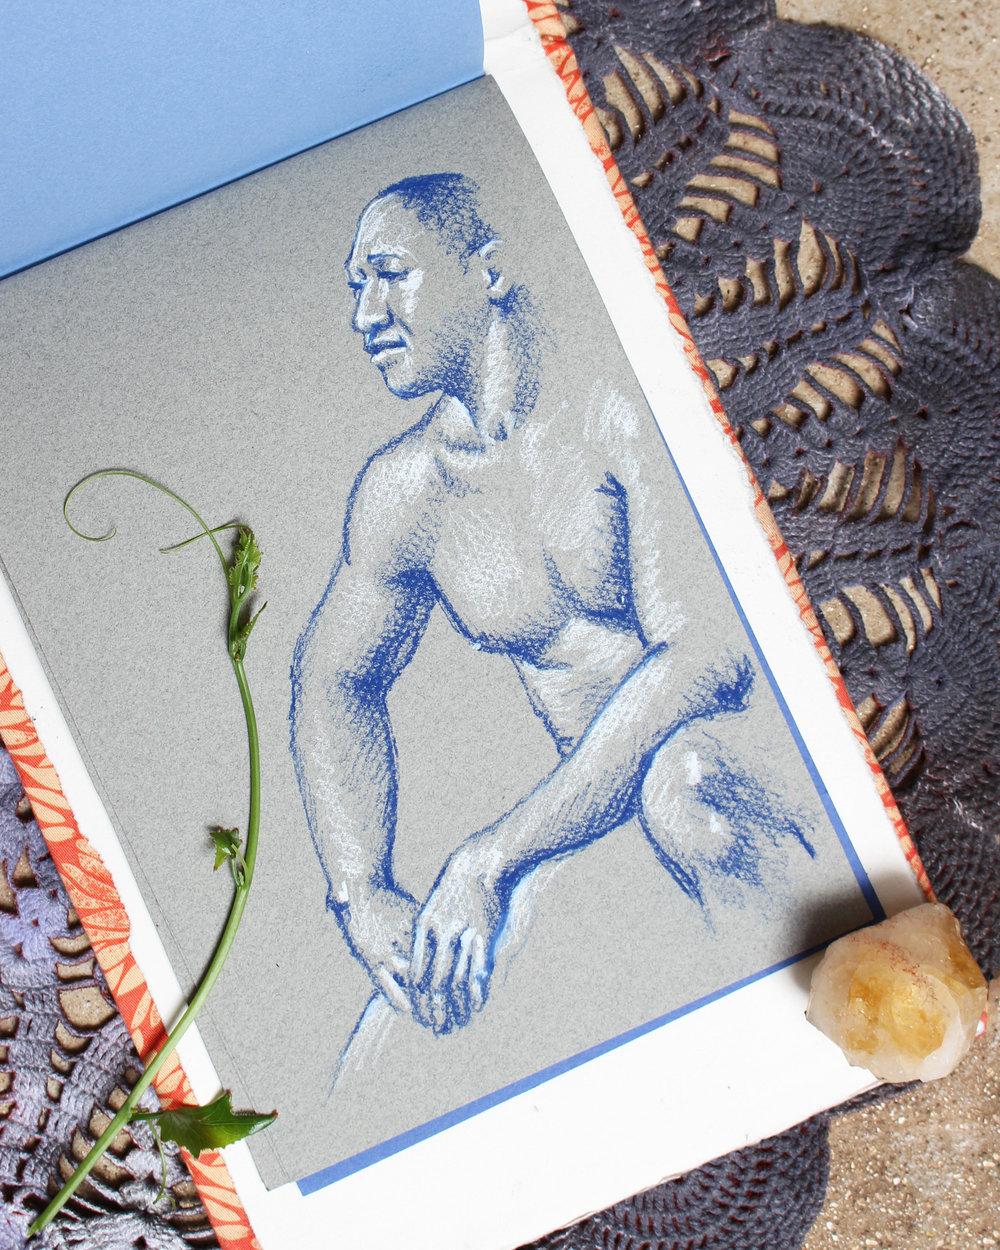 life drawing of black man